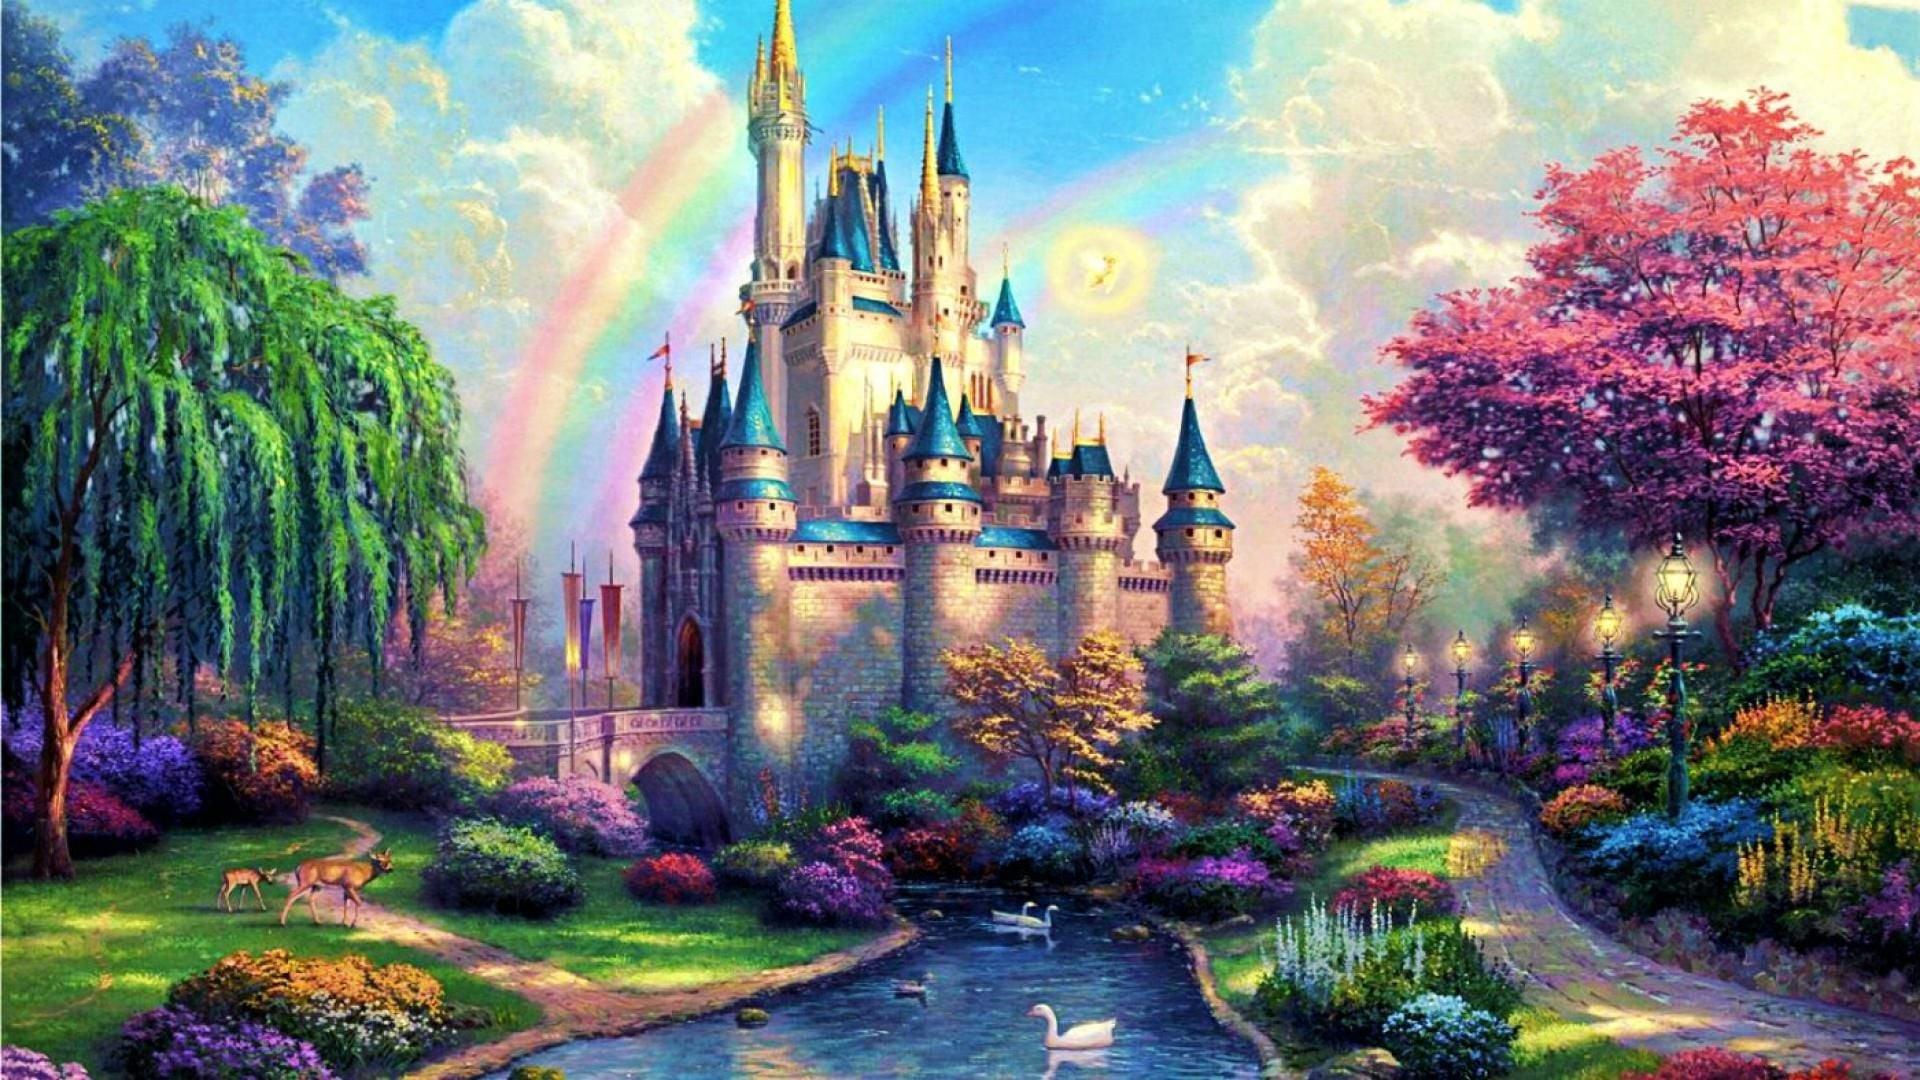 … disney castle wallpaper desktop background …